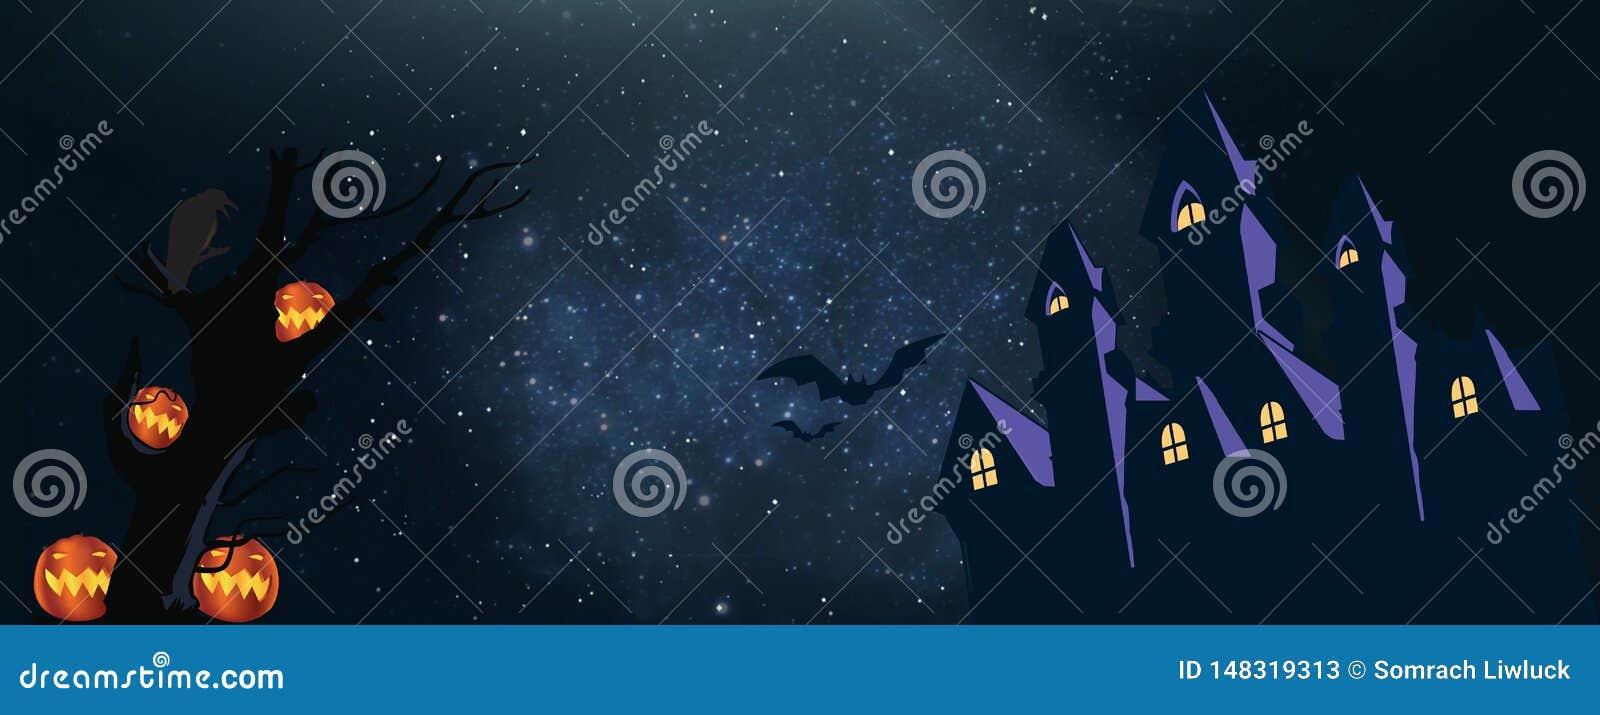 Ik hoop u groot Halloween hebt VERBLIJFSbrandkast